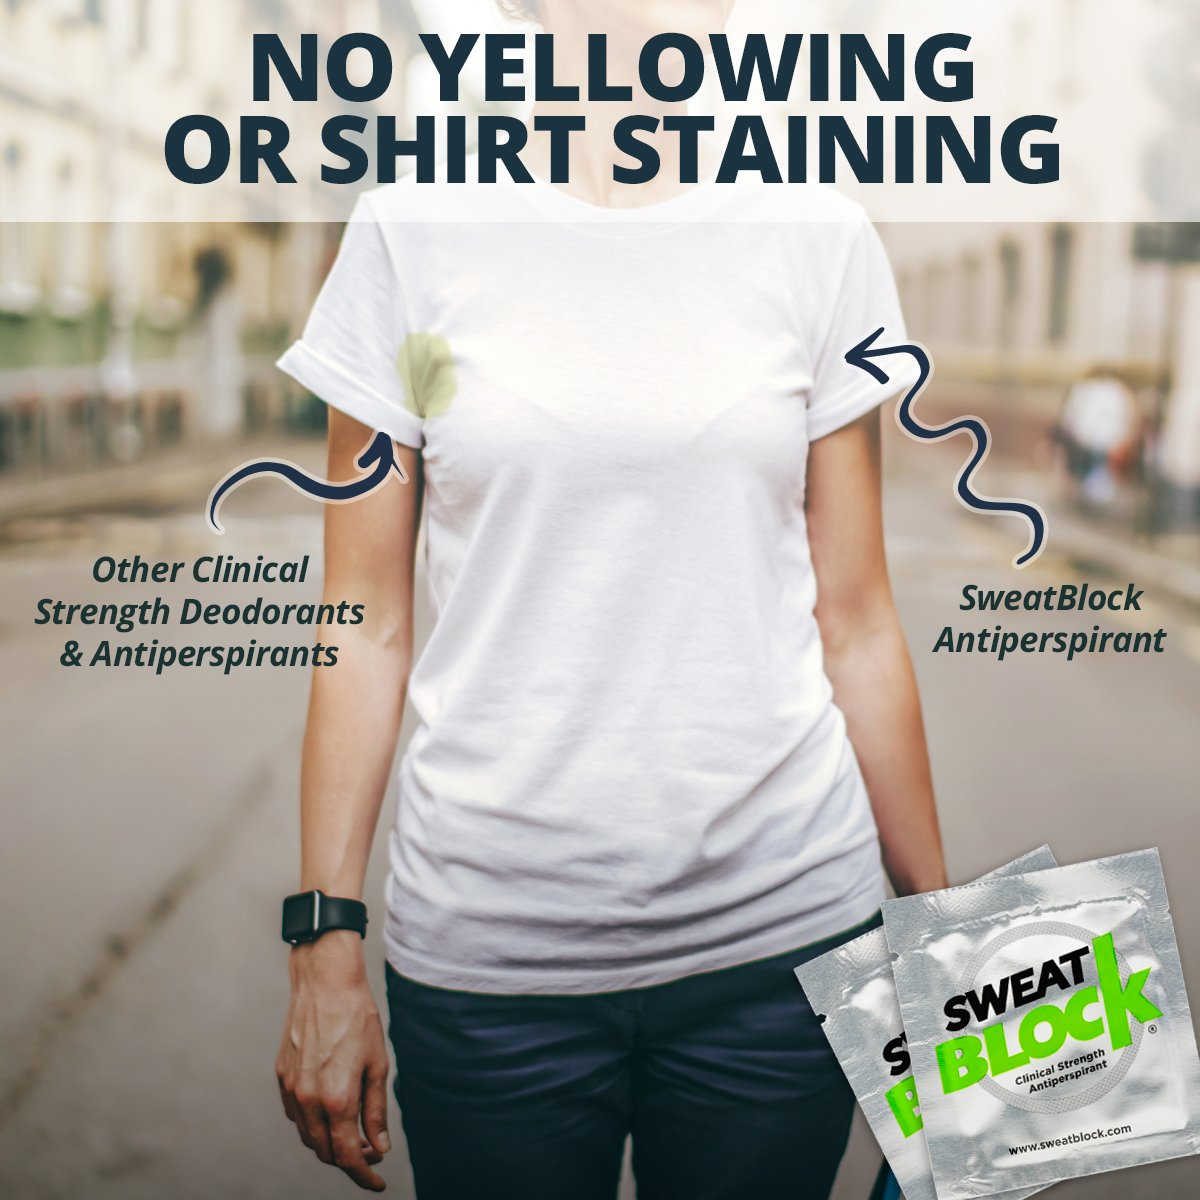 SweatBlock Antiperspirant - Clinical Strength - Reduce Sweat up to 7-days per Use by SweatBlock (Image #8)